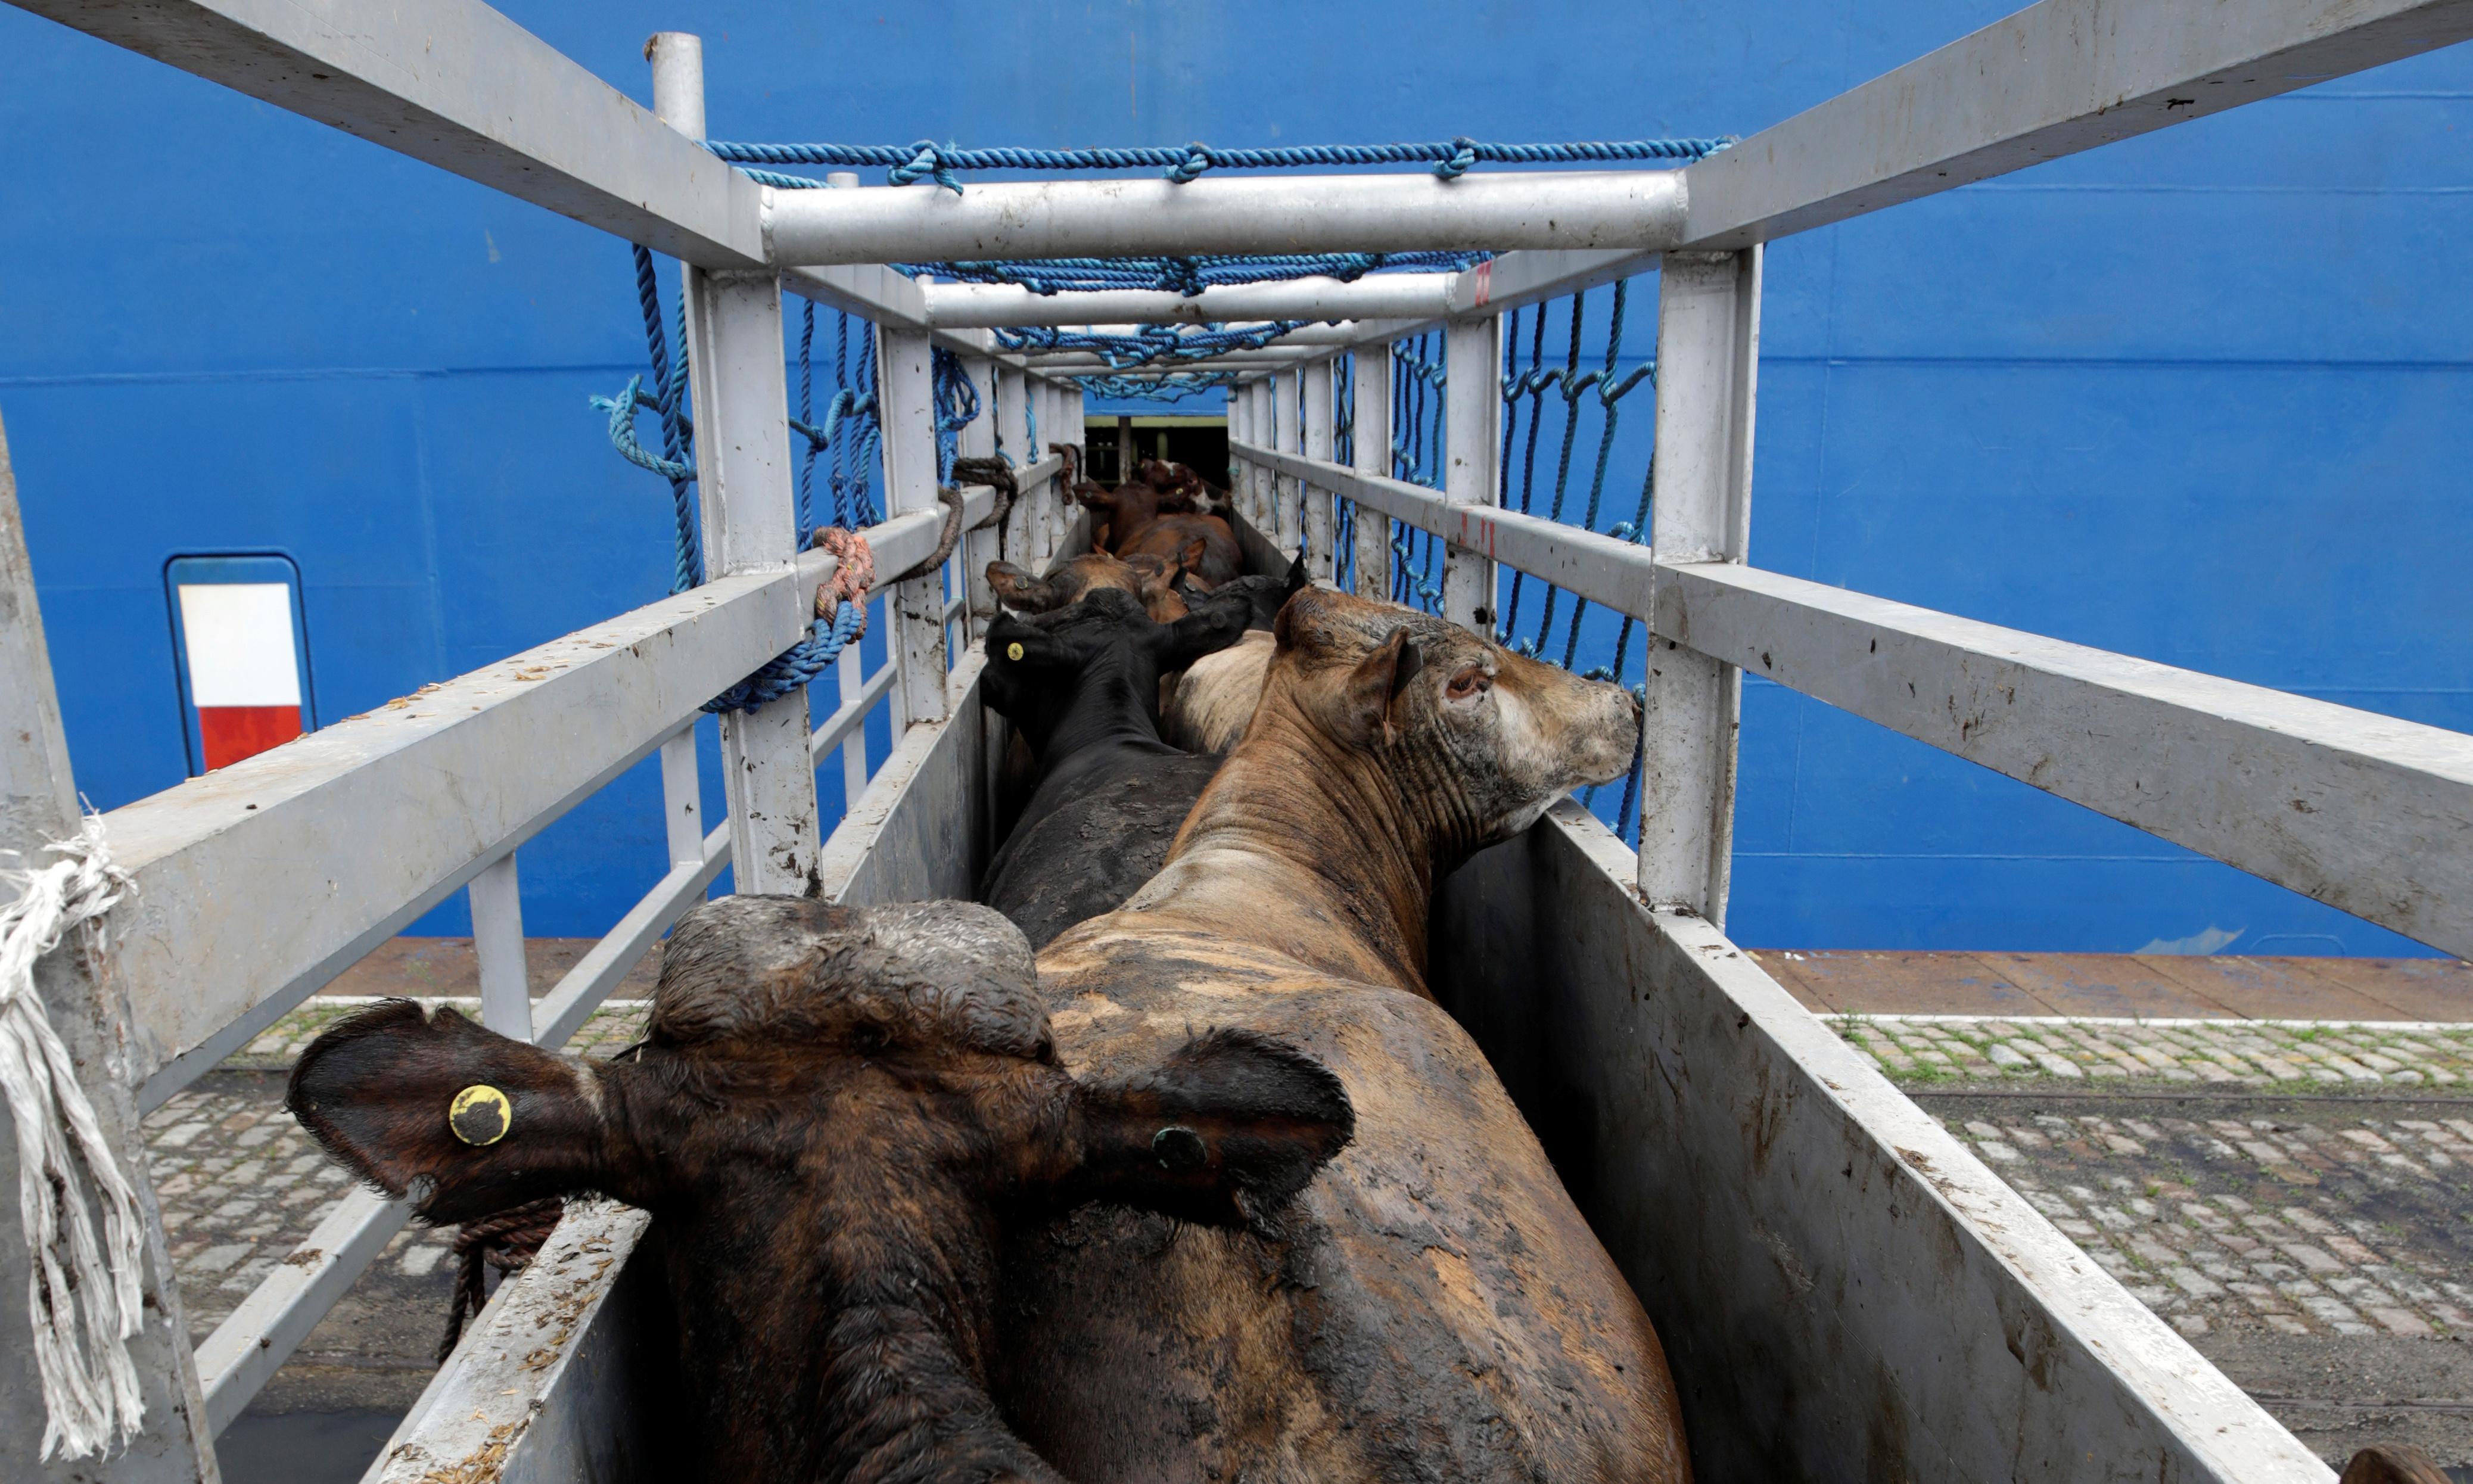 Ireland revokes licence of livestock ship operator over low performance rating